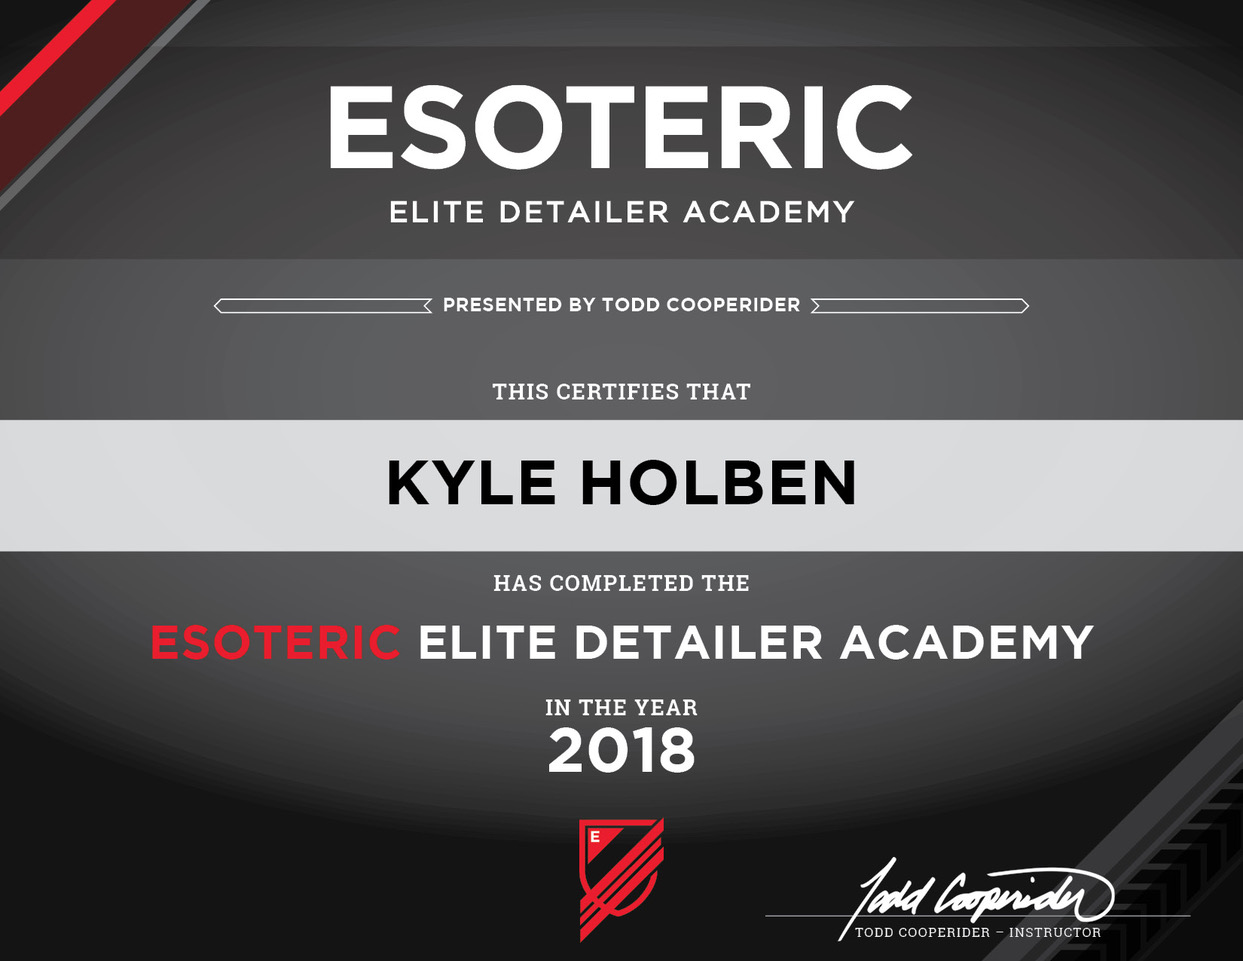 esoteric-elite-detailer-academy-kyle-holben-img.jpeg